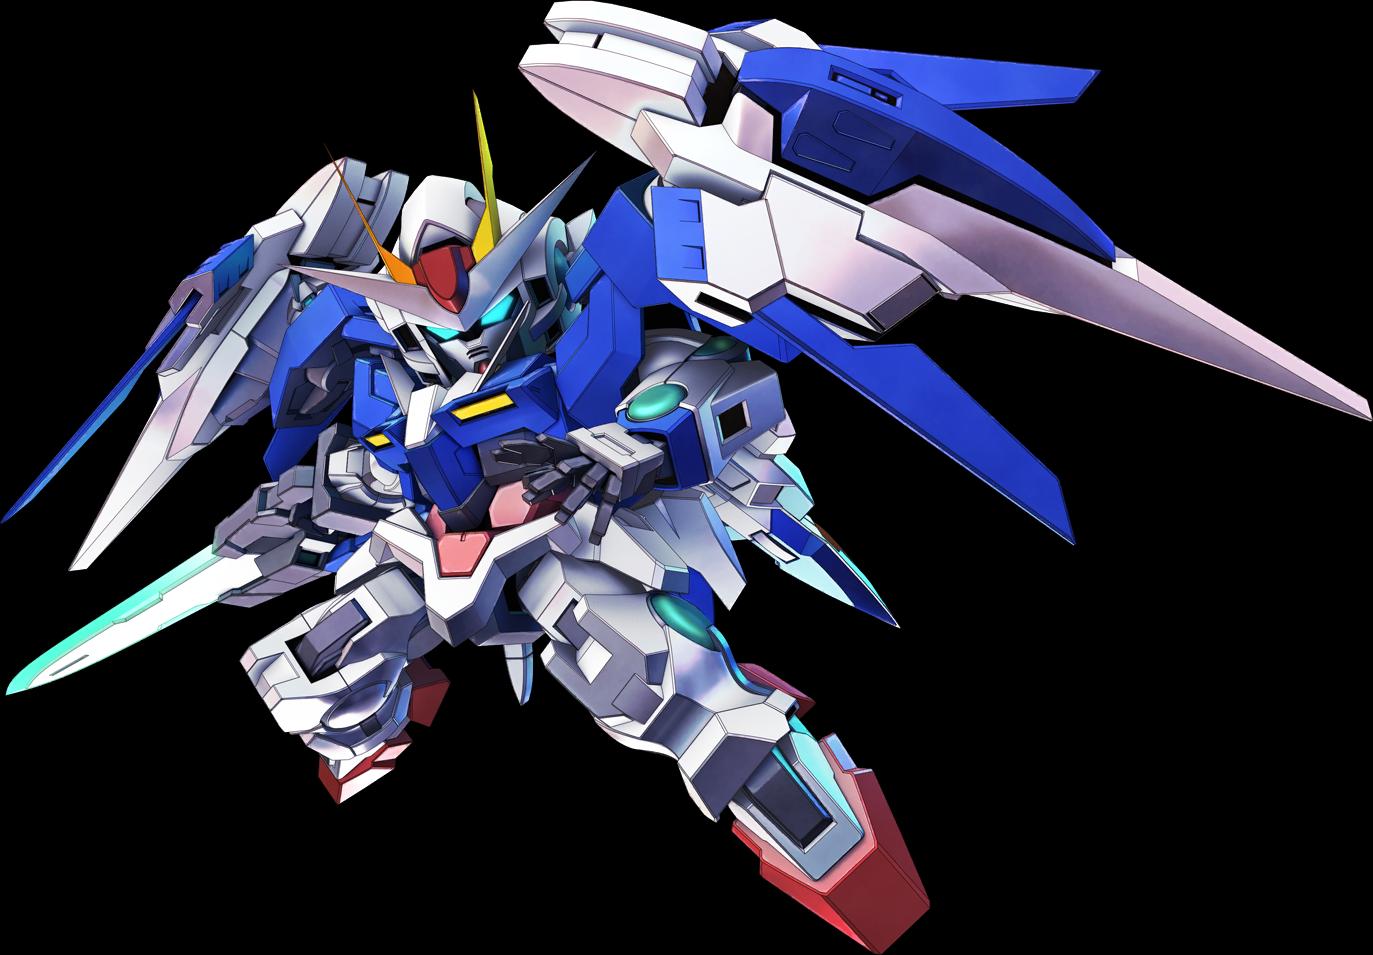 00 Raiser Final Battle Type Cross Rays Sd Gundam G Generation Library Fandom